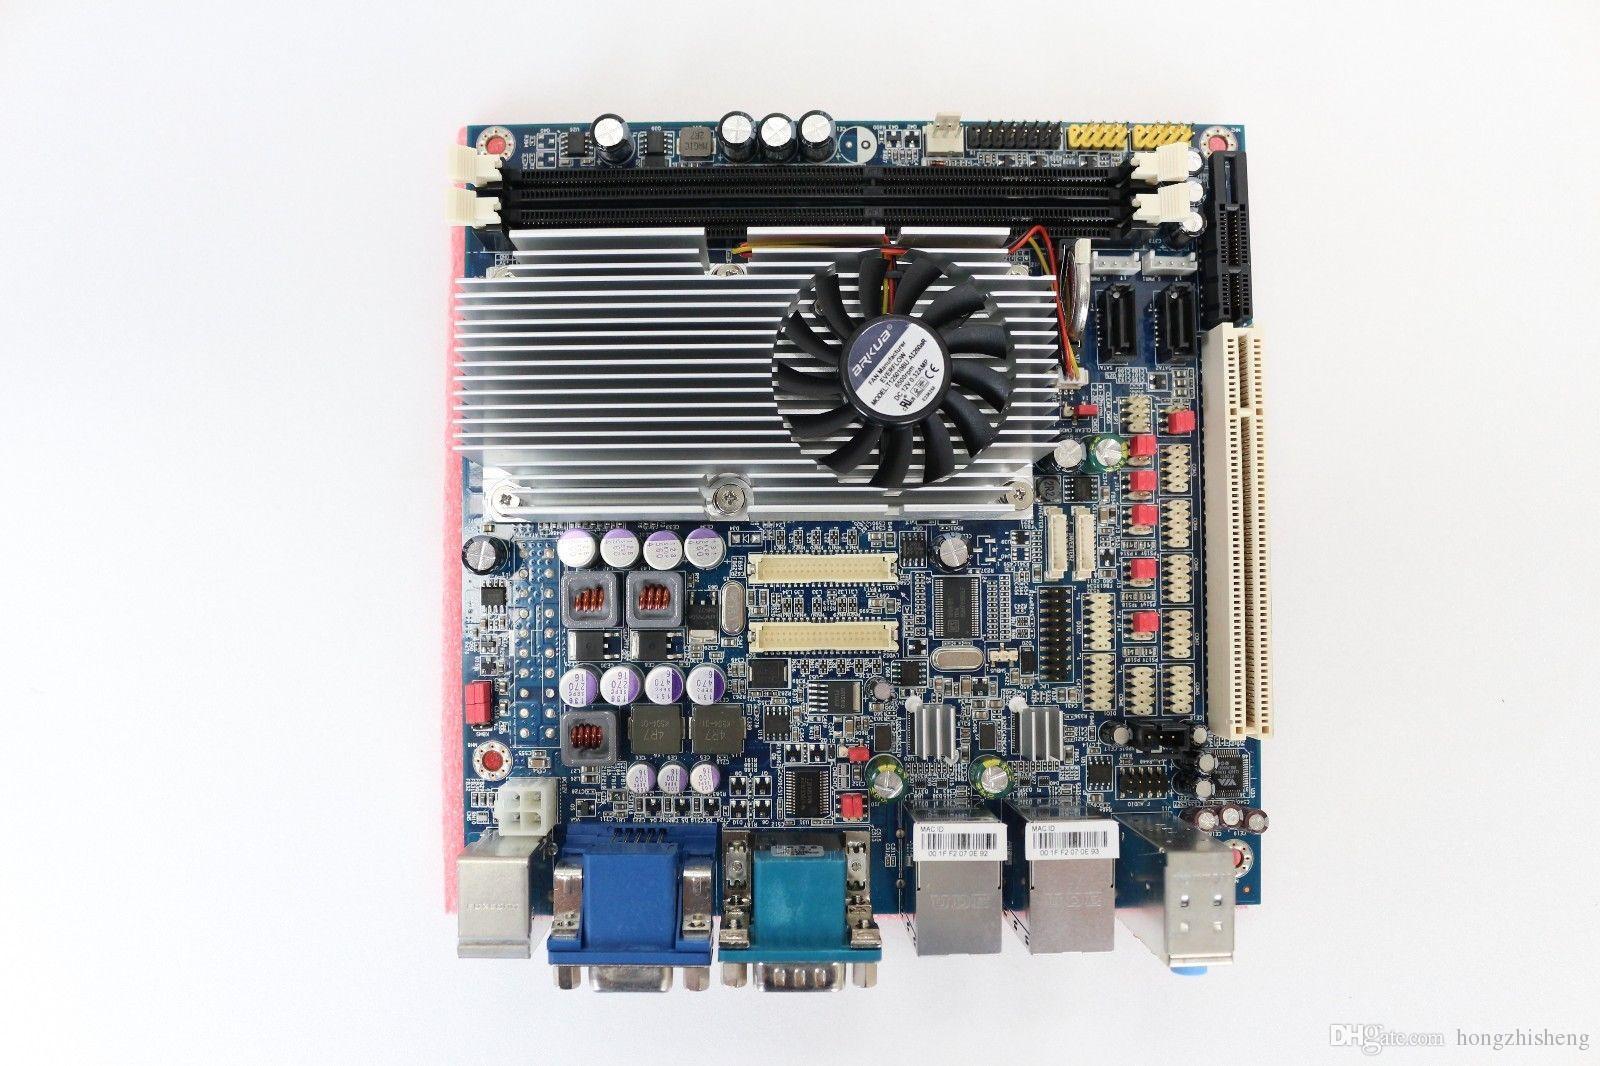 Mini-ITX материнская плата EPIA-M910 используется